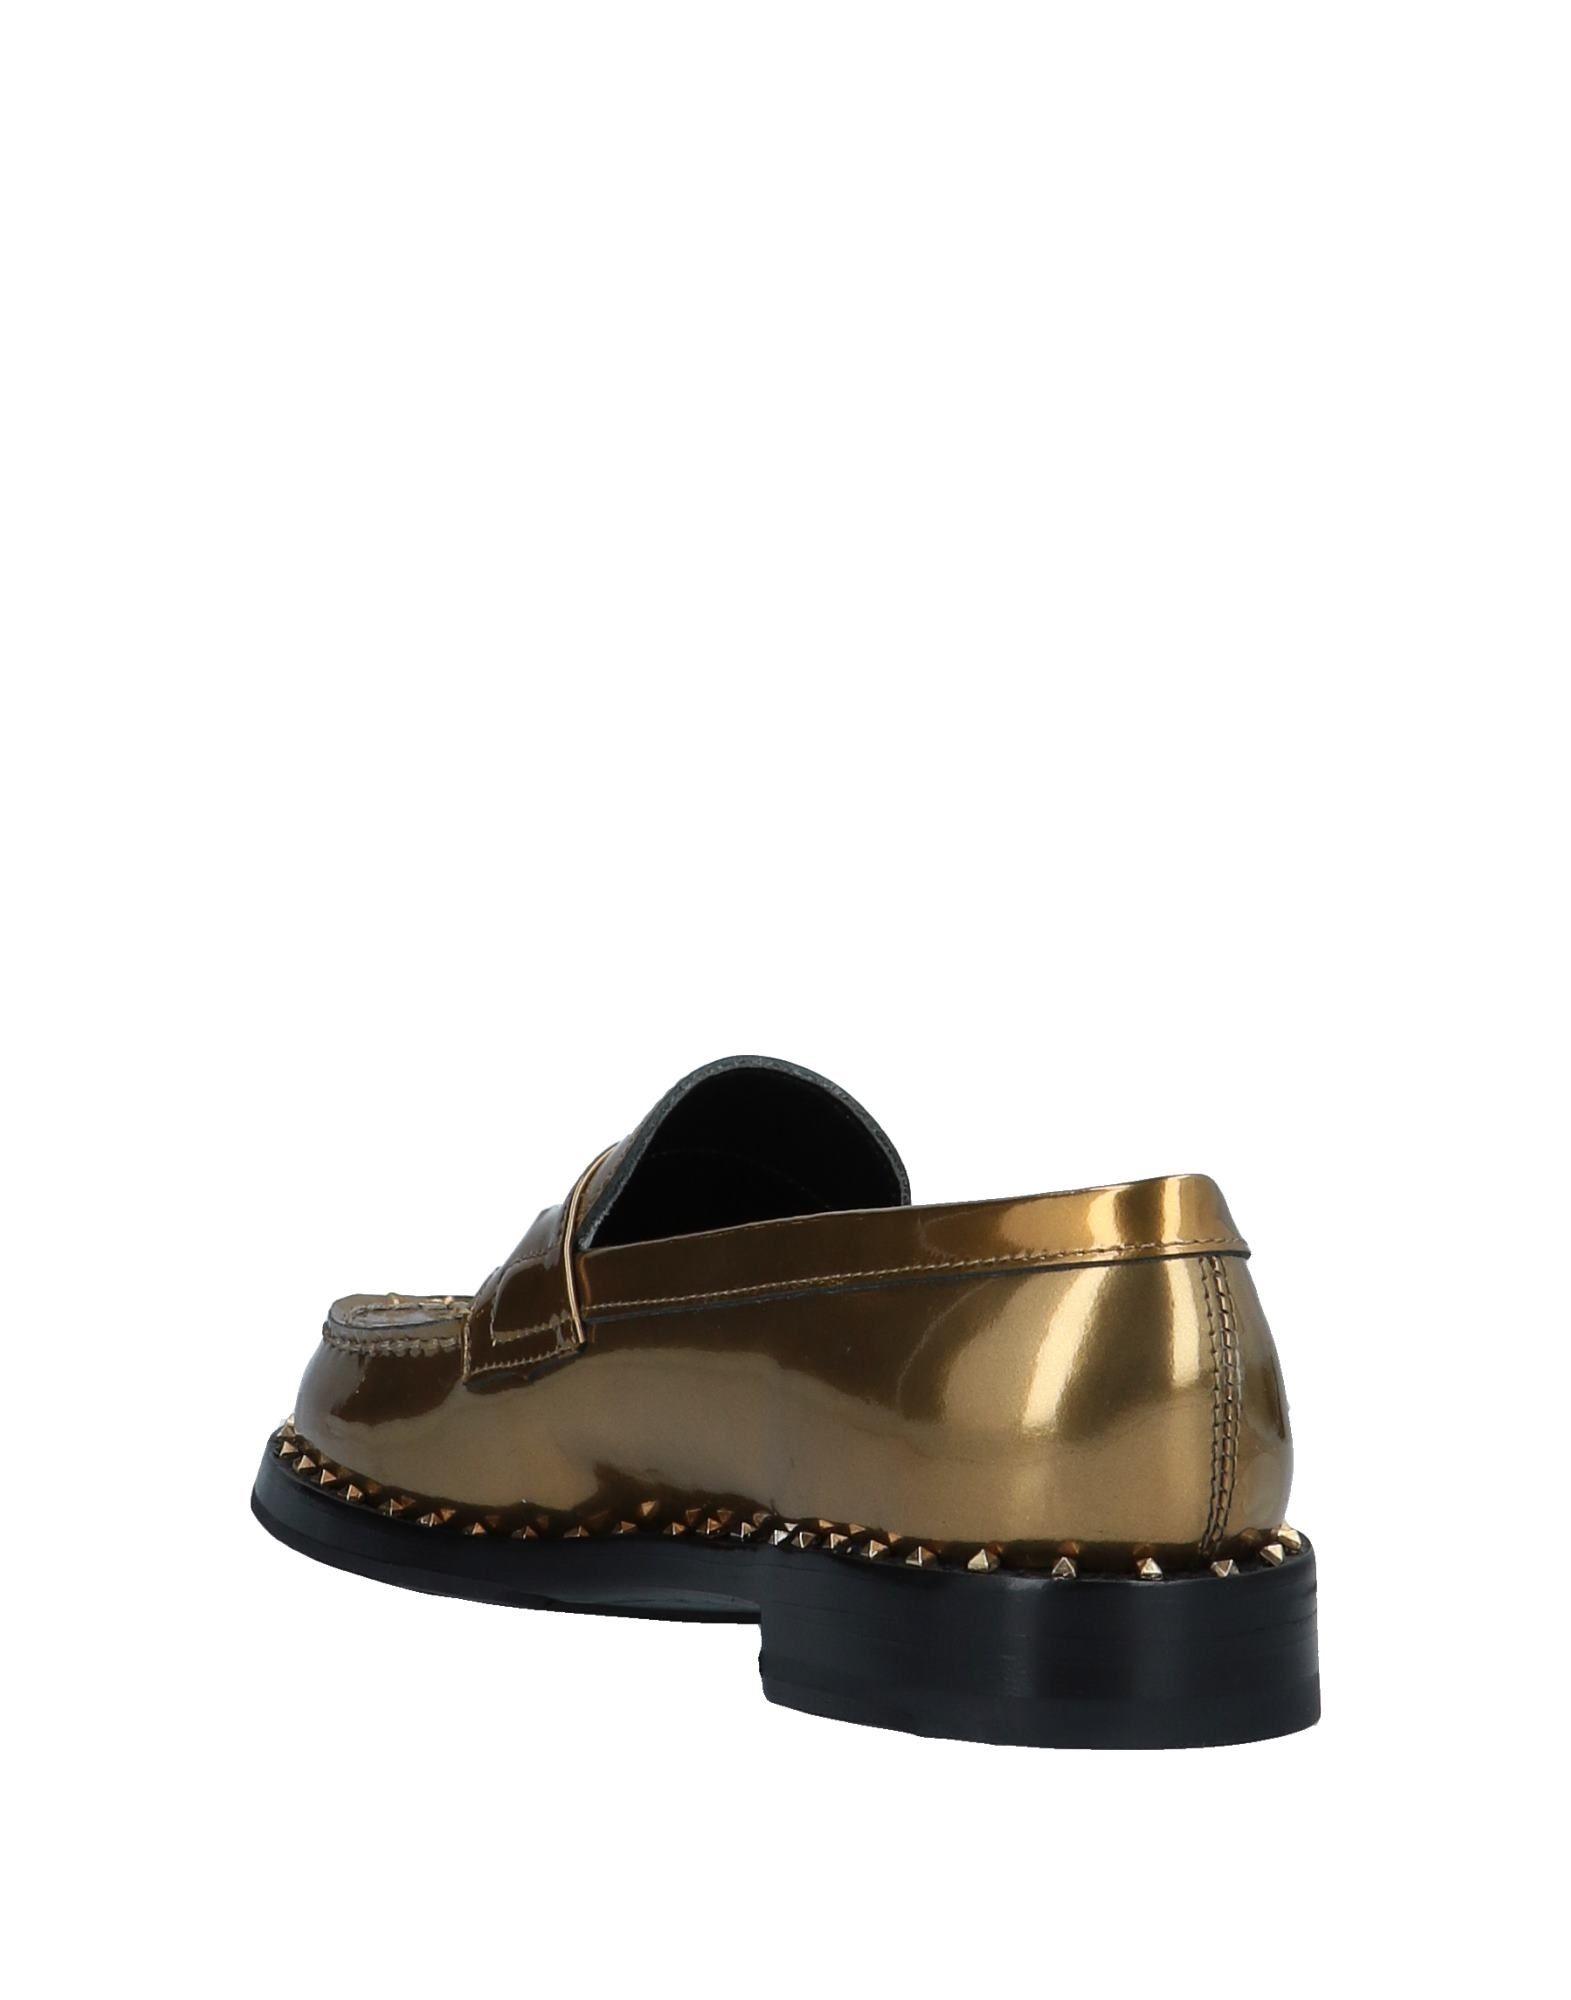 Stilvolle Damen billige Schuhe Ash Mokassins Damen Stilvolle  11557804GN 26afef